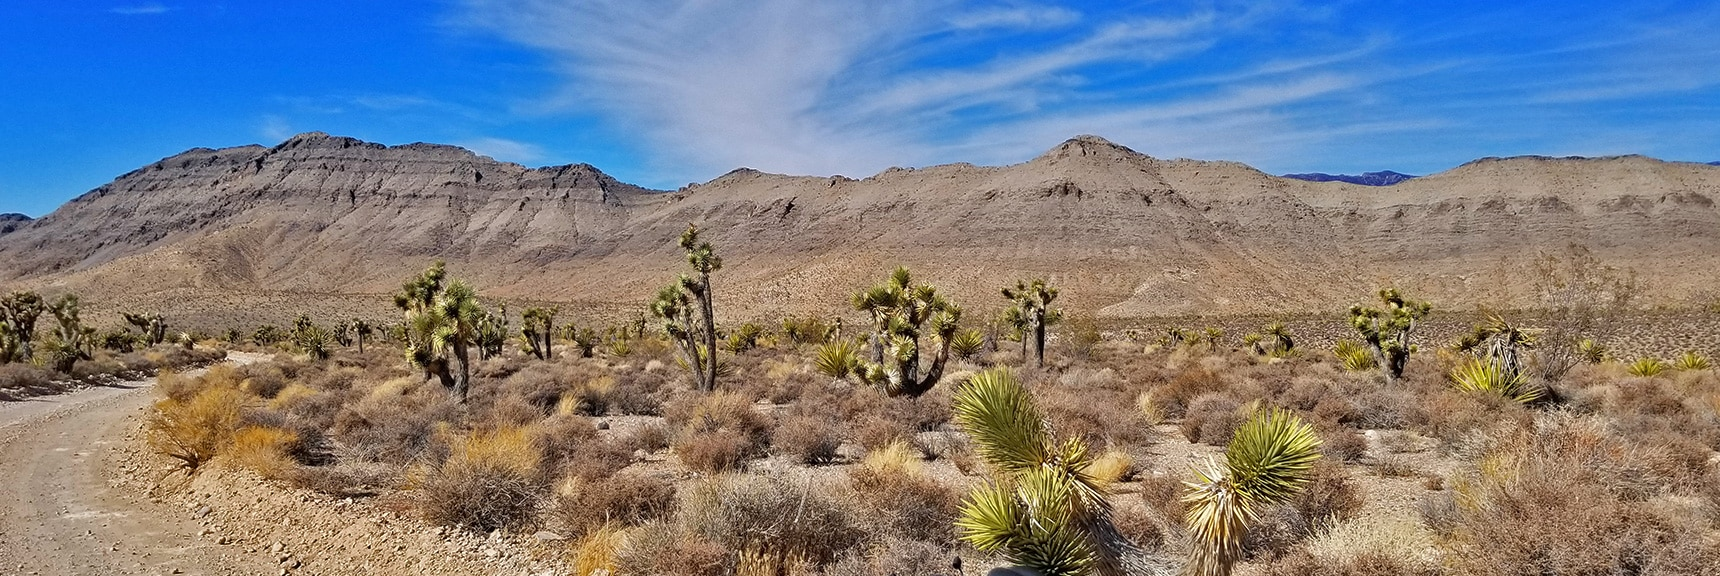 Fossil Ridge Viewed from Gass Peak Road Near Trailhead | Gass Peak Road Circuit | Desert National Wildlife Refuge | Nevada